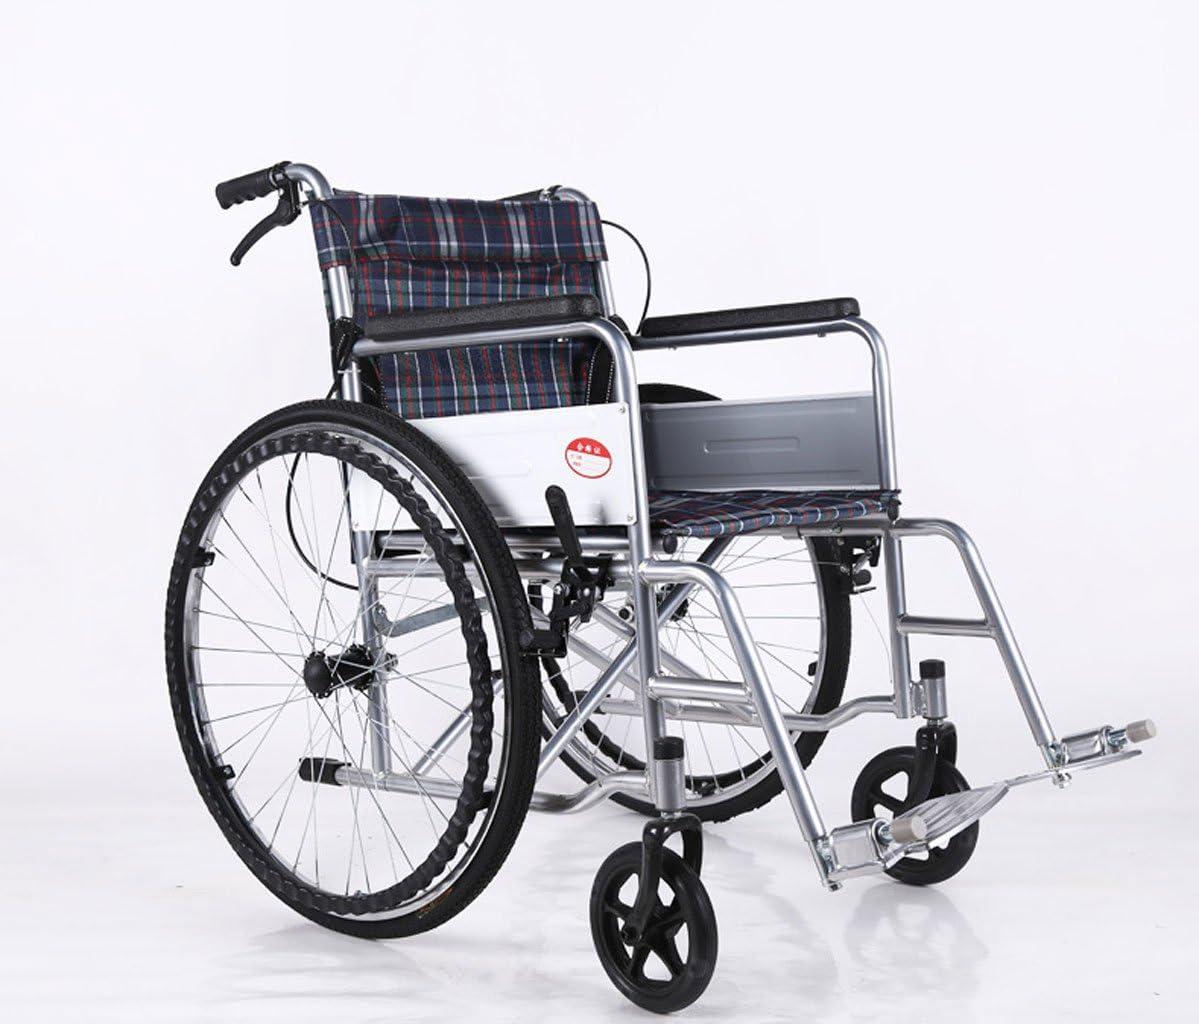 LiuBin- Silla de Ruedas Silla de Ruedas Manual, Plegado Ligero, discapacitado, Silla de Ruedas para Ancianos, Dispositivos médicos portátiles